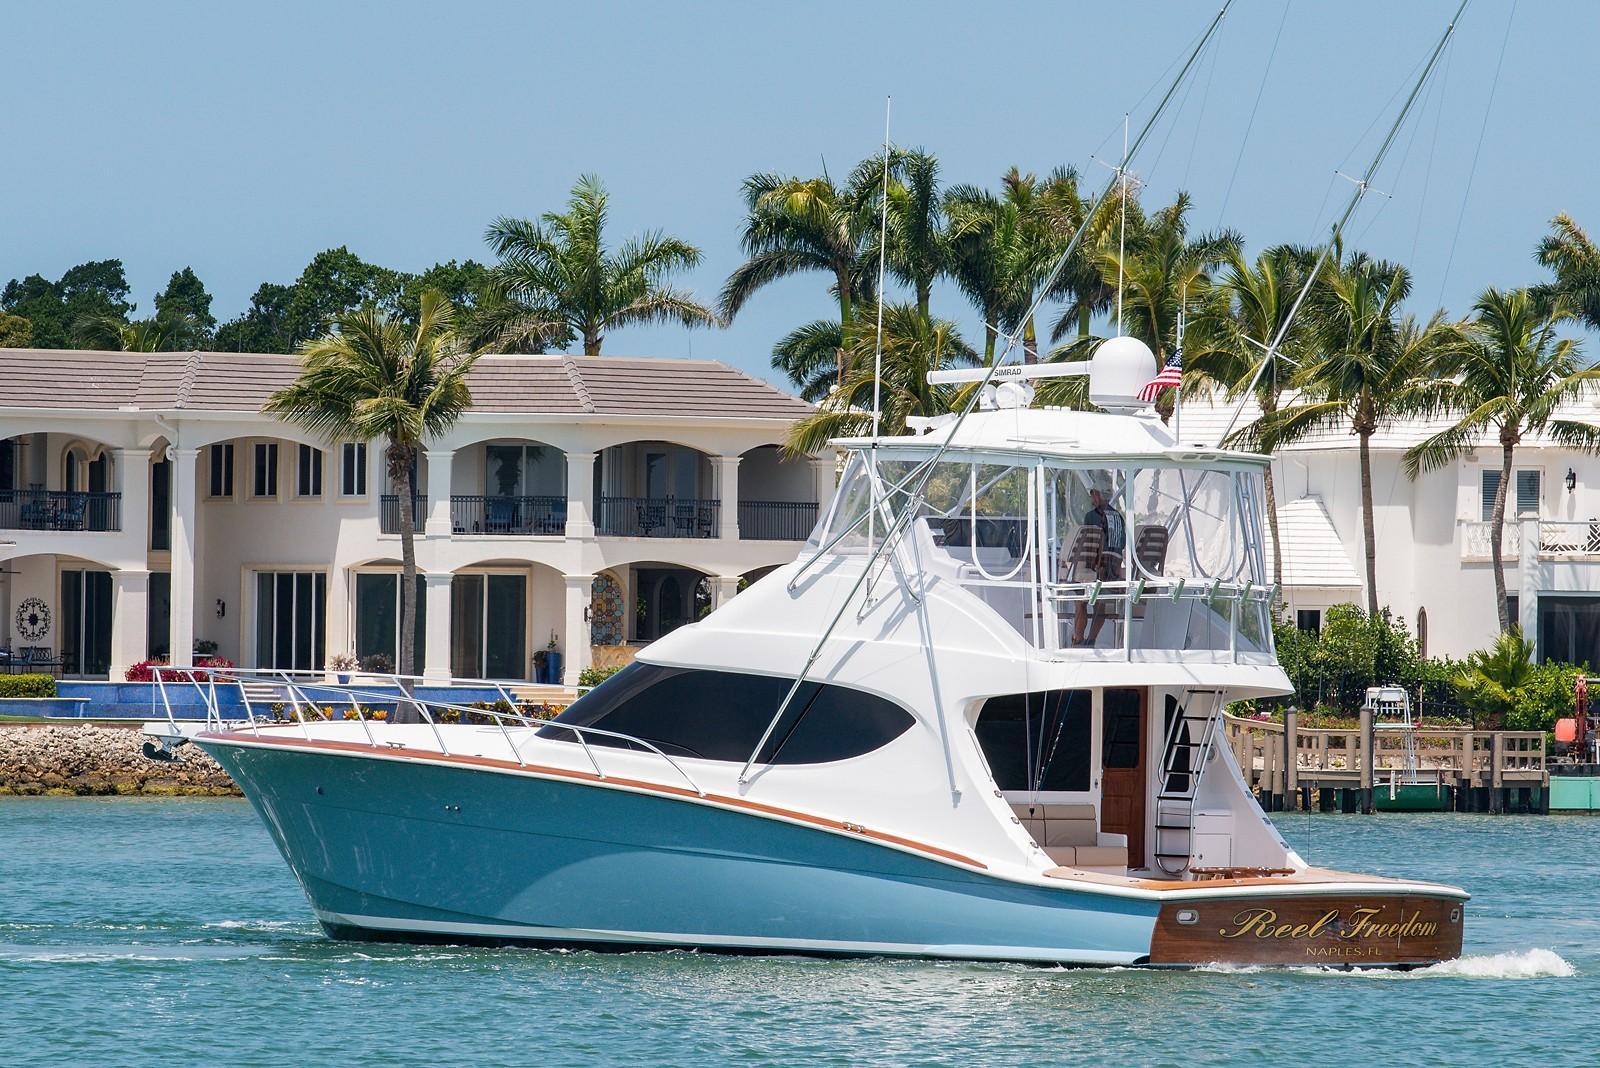 2018 hatteras gt 54 power boat for sale www yachtworld com rh yachtworld com